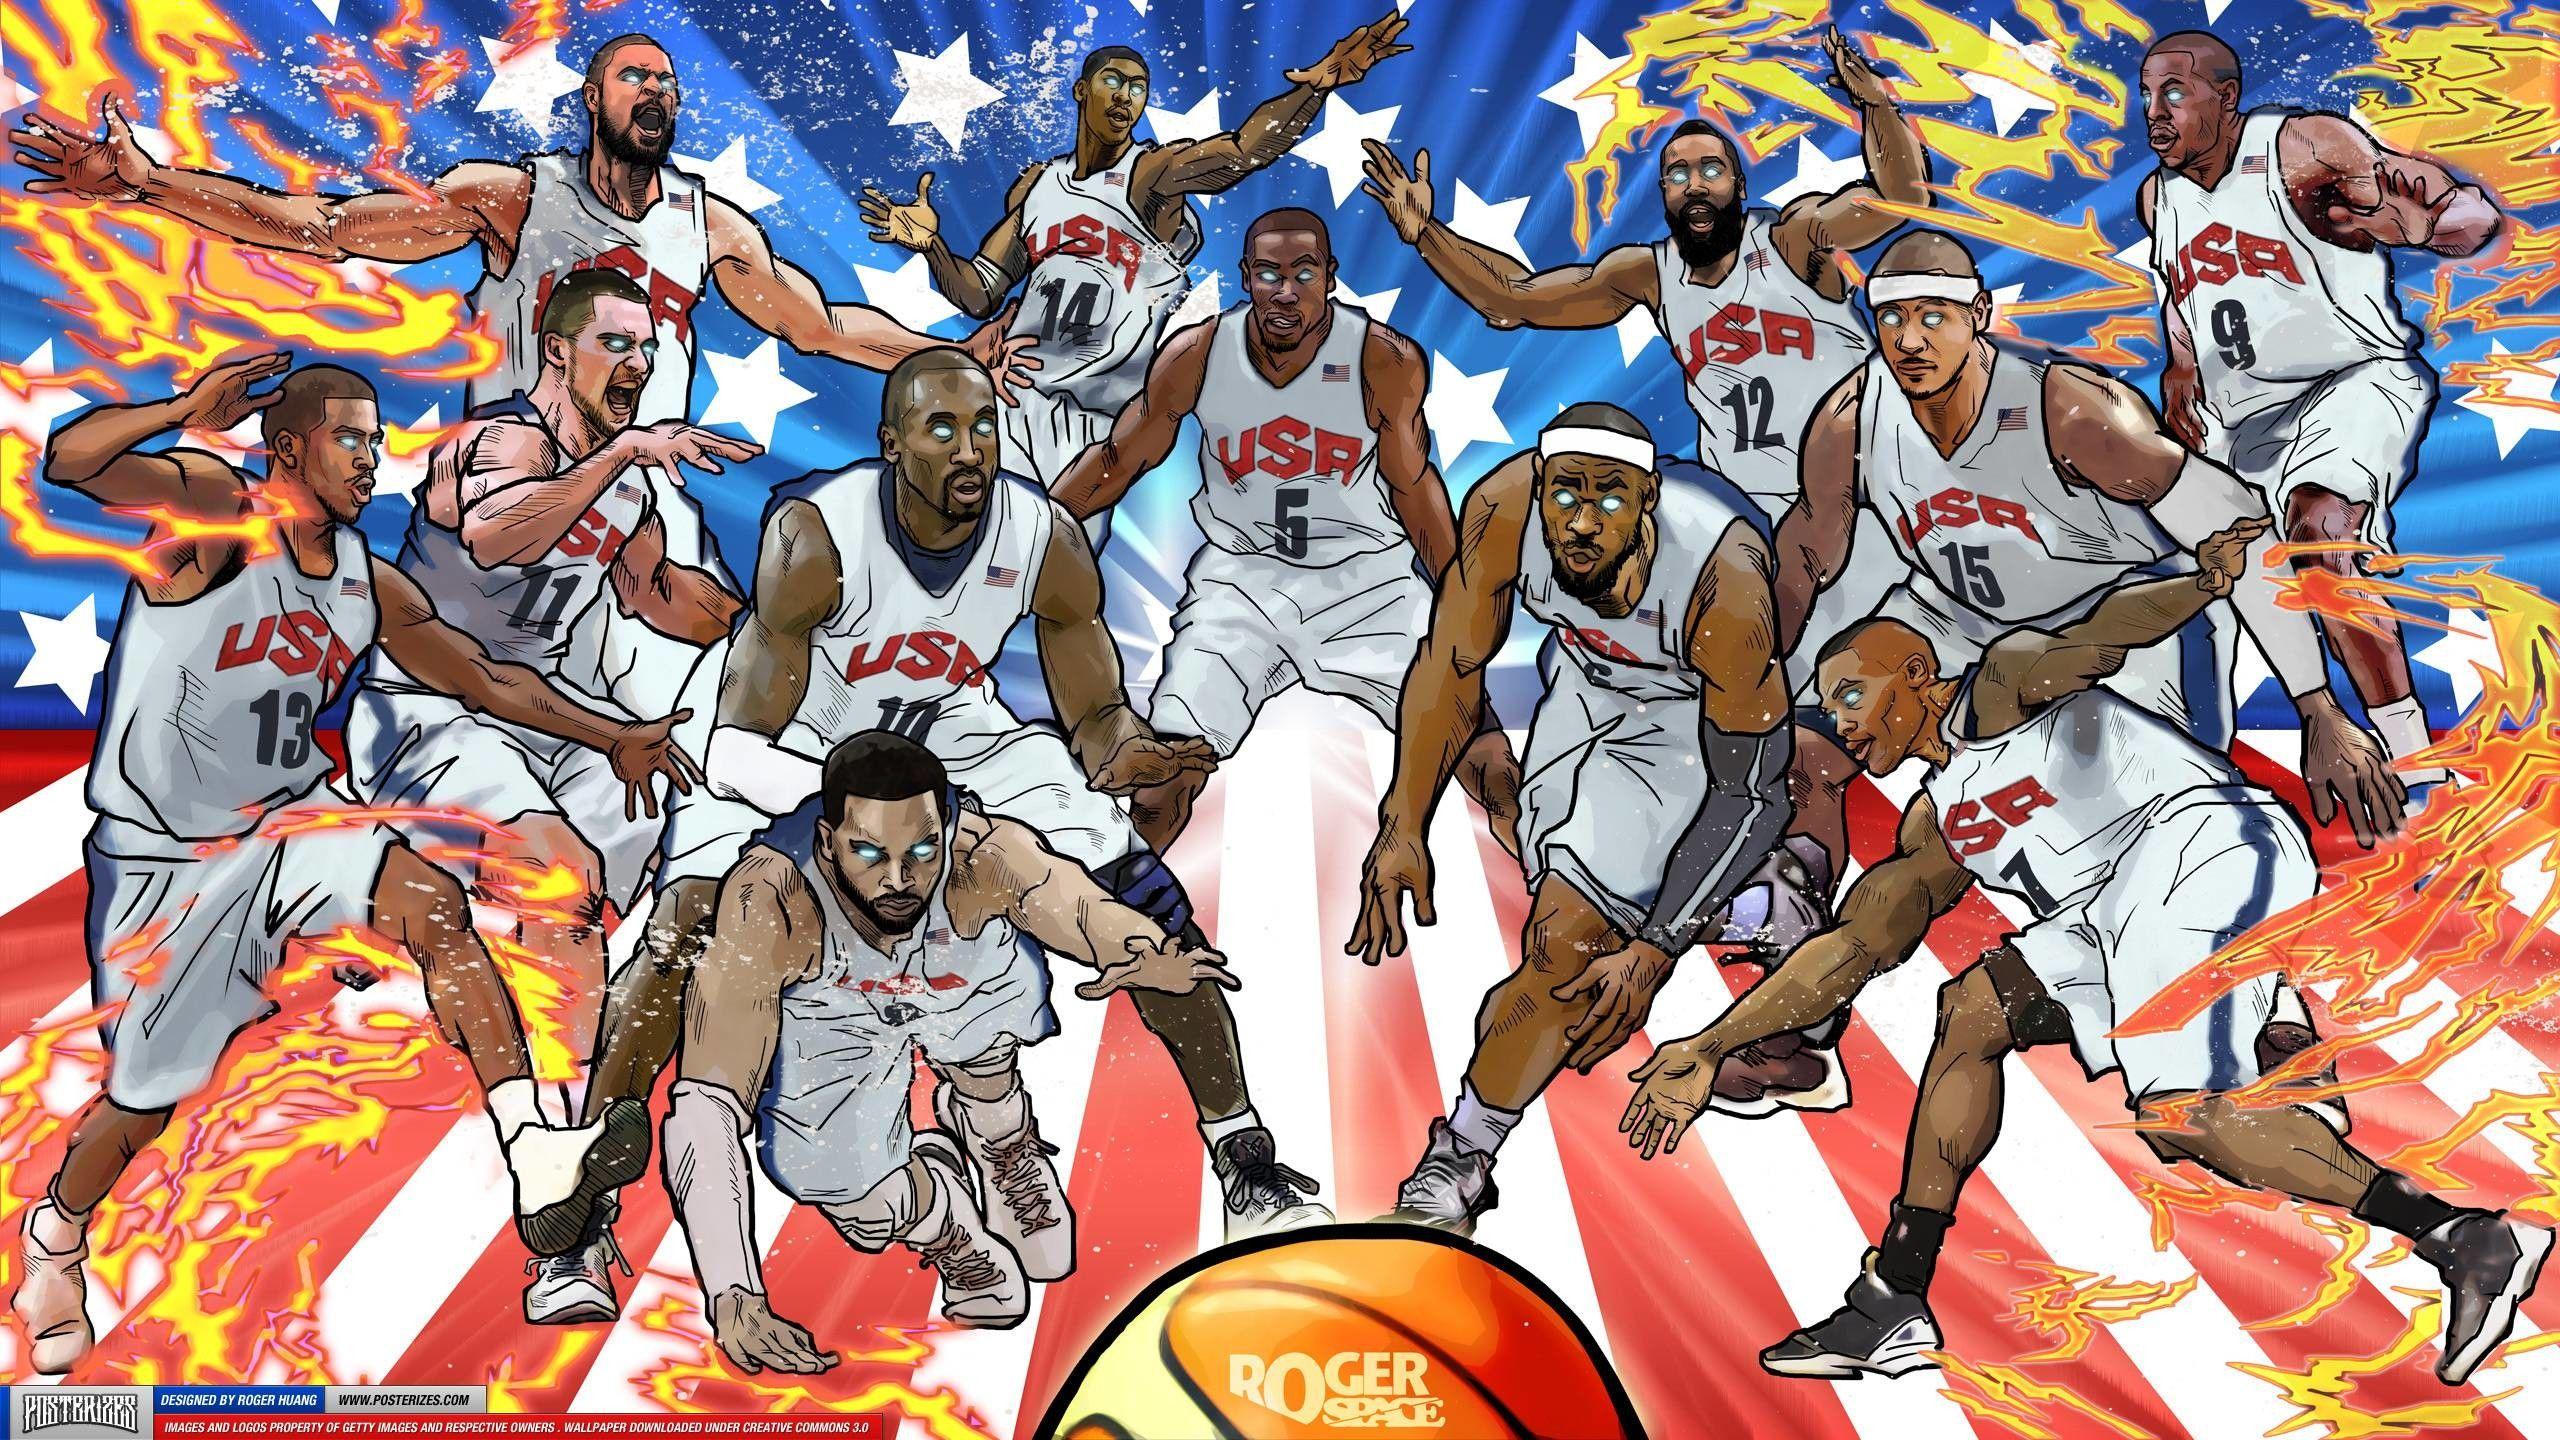 NBA Wallpapers   Top NBA Backgrounds   WallpaperAccess 2560x1440